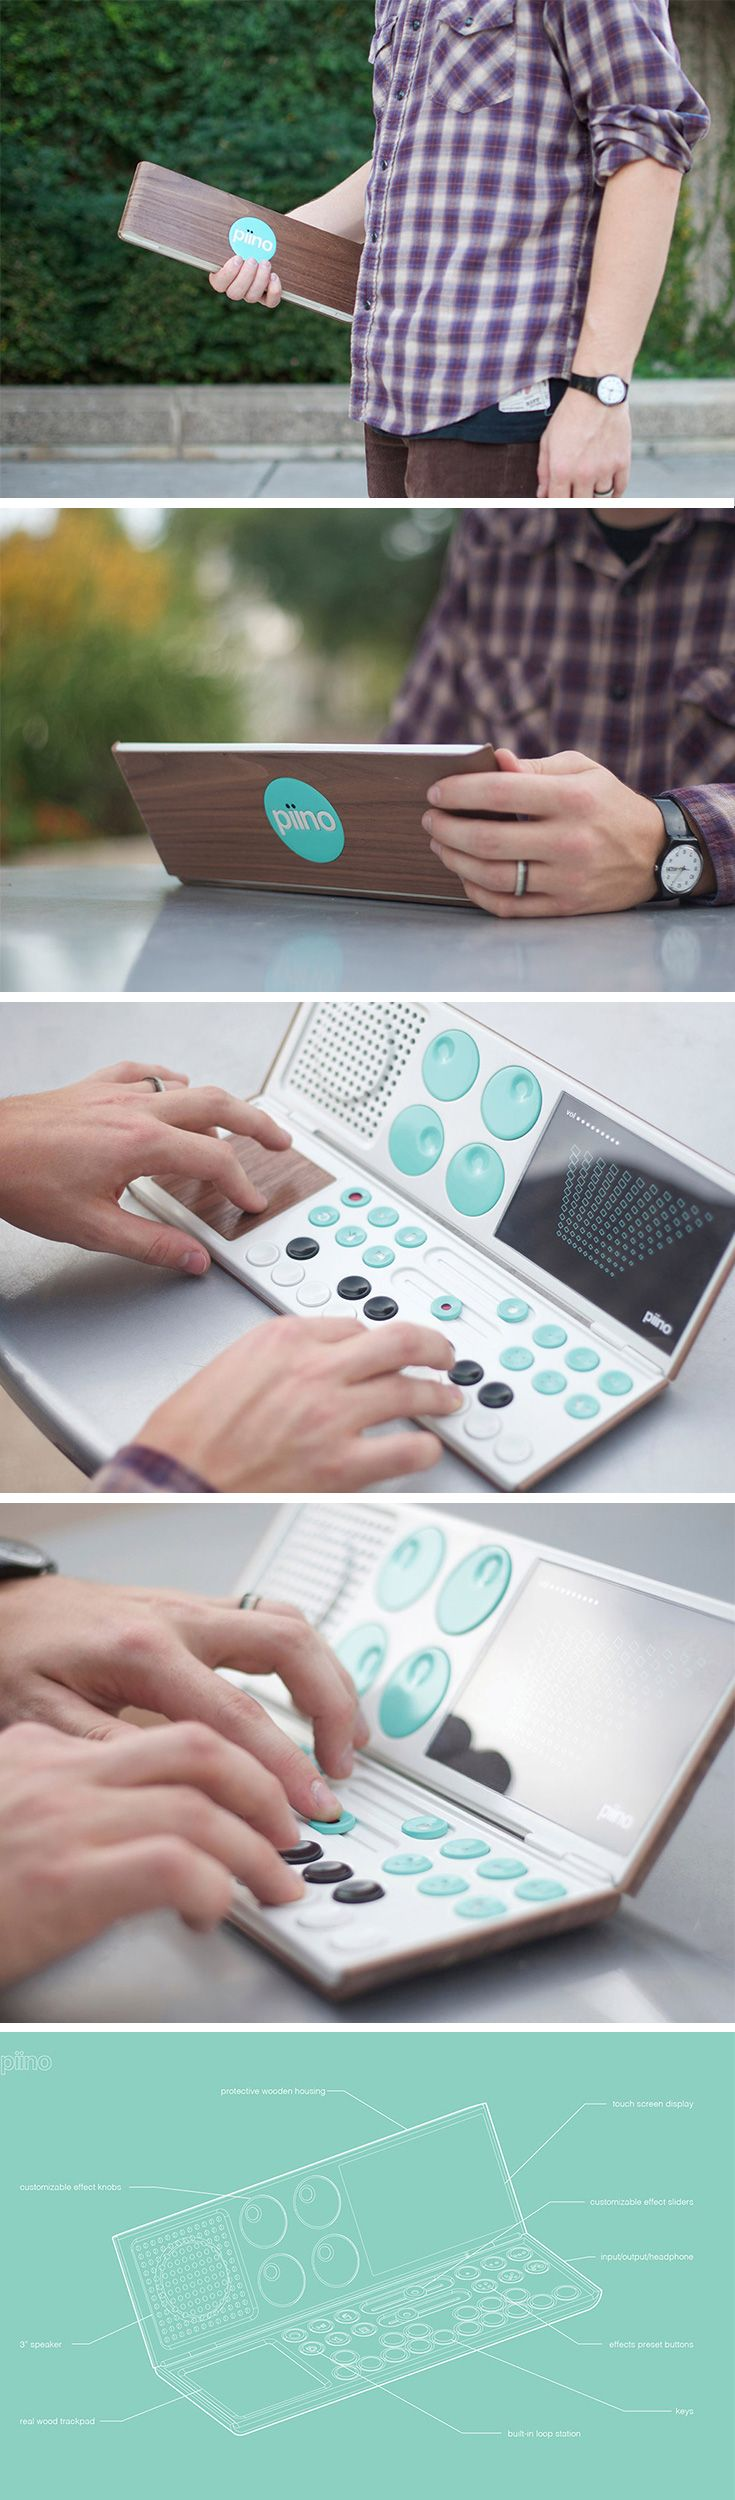 Piino Synthesizer //